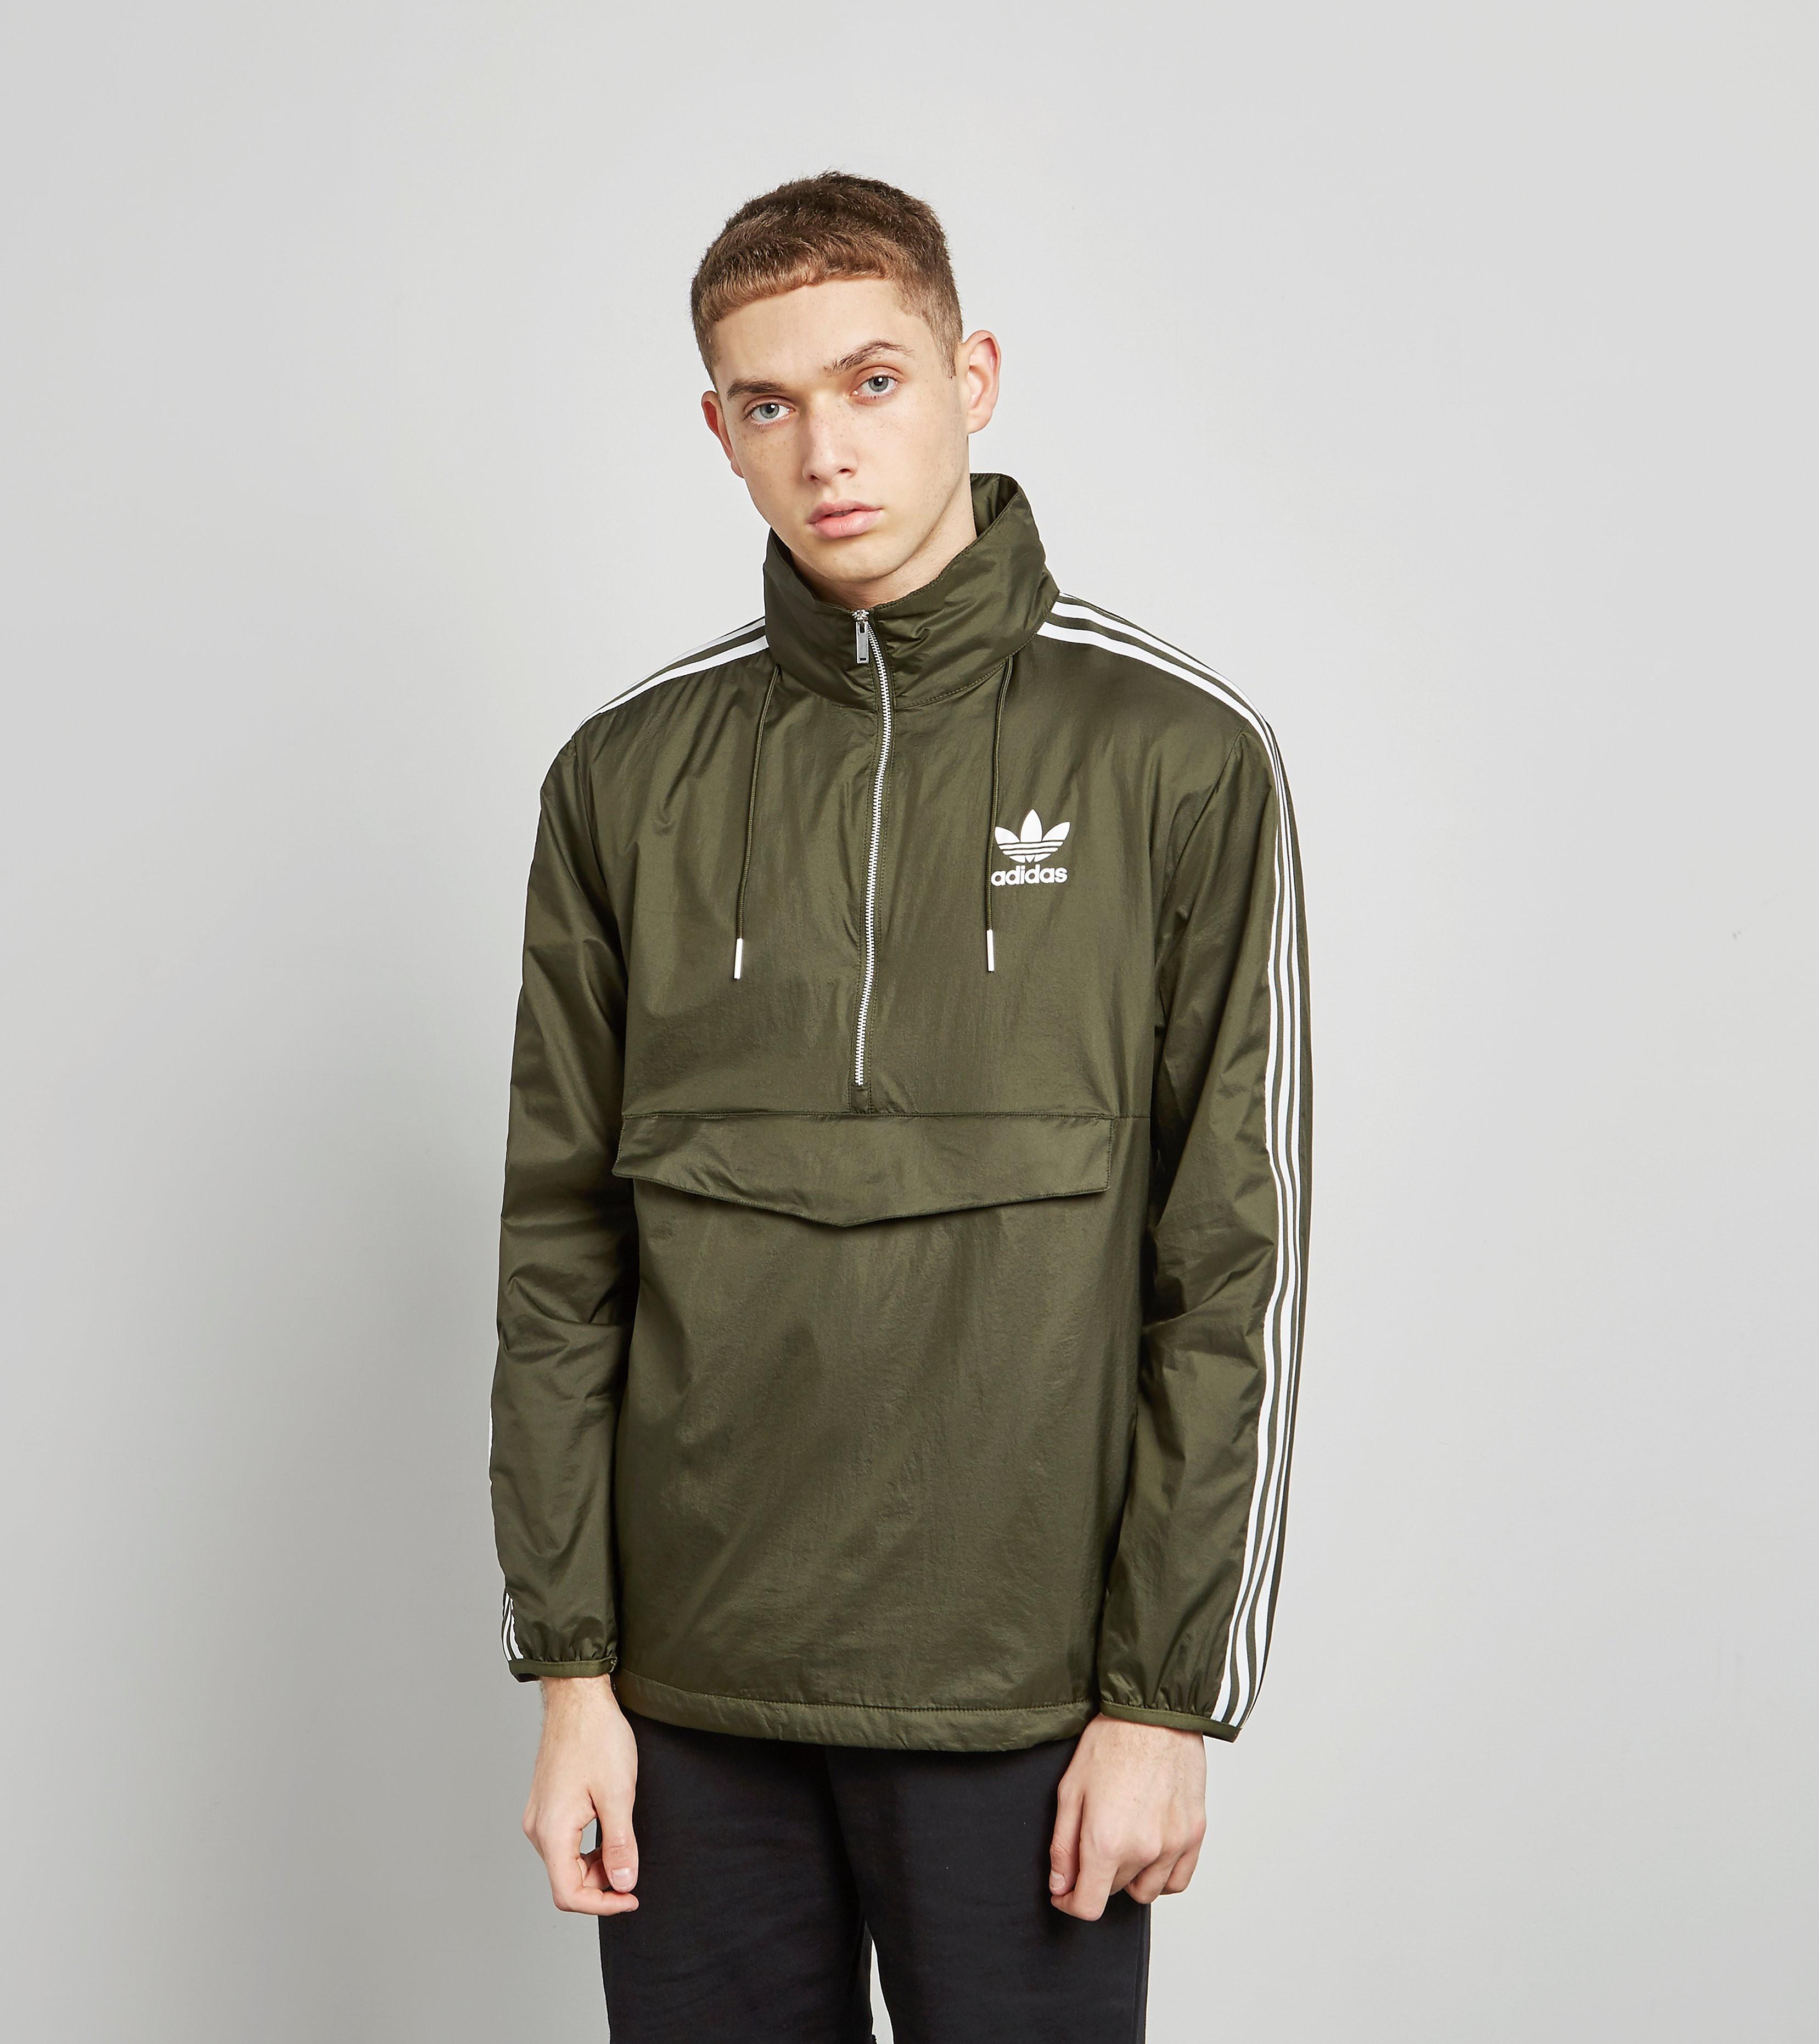 adidas Originals Windbreaker Jacket - size? Exclusive